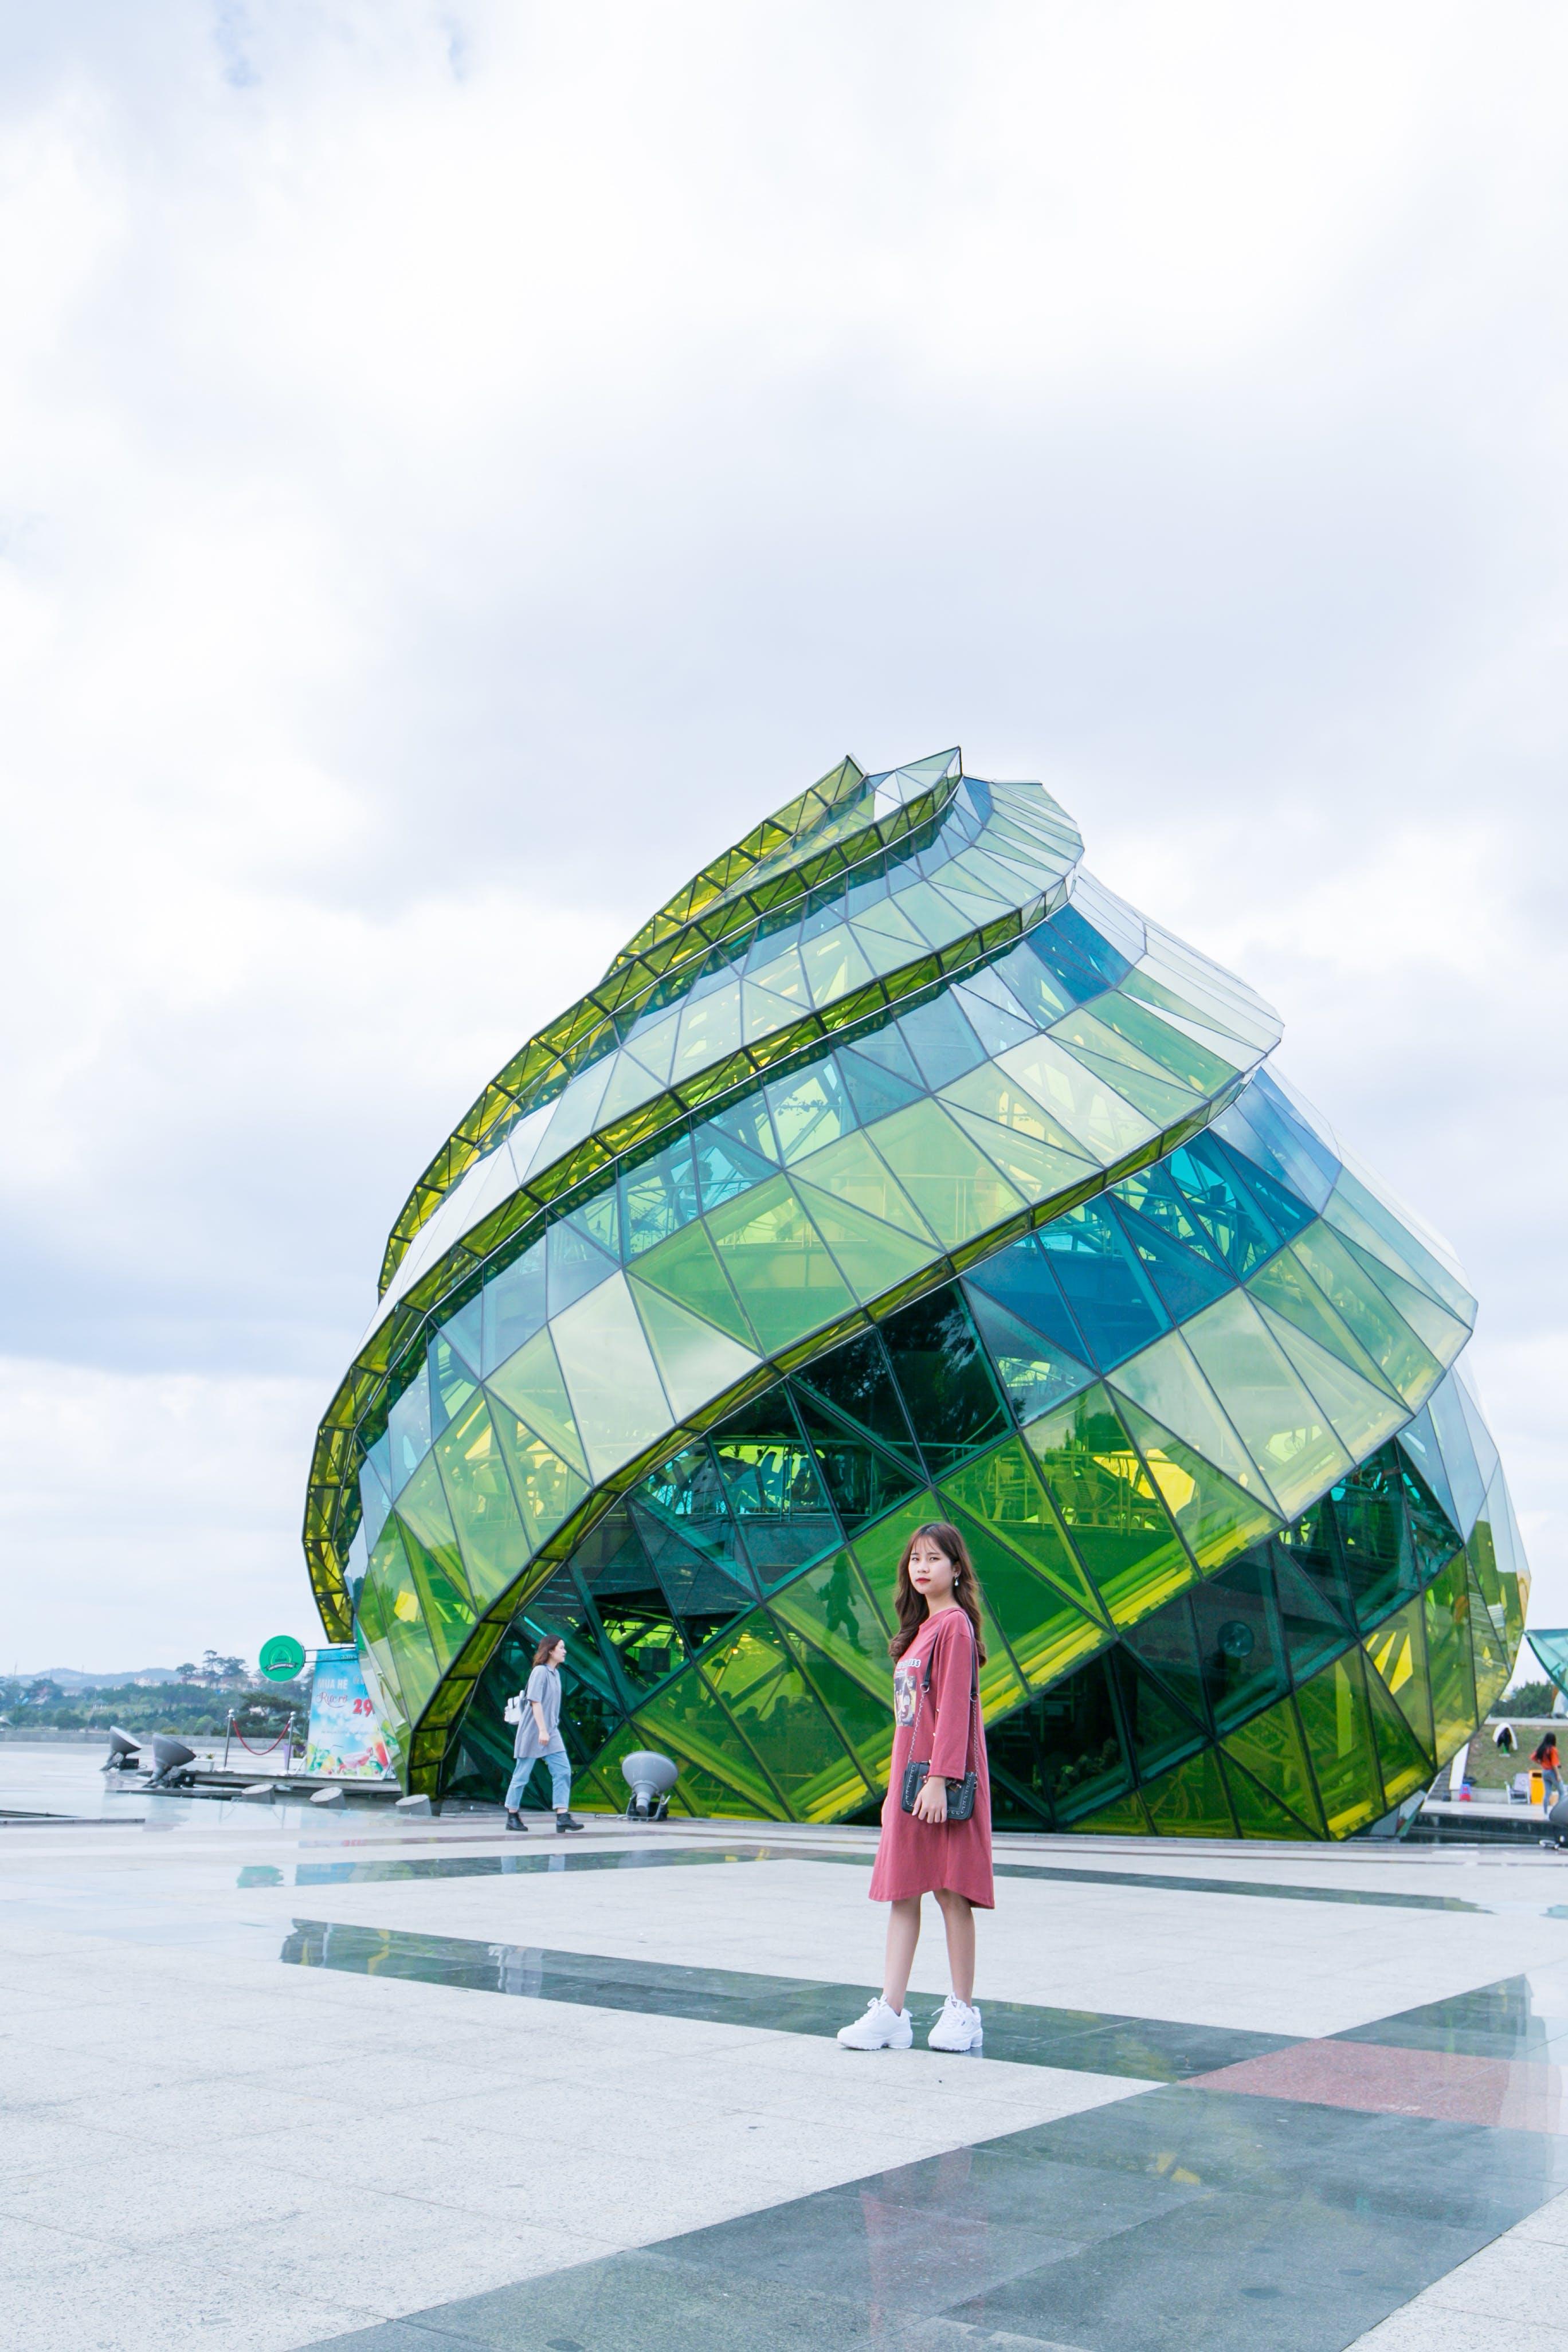 Gratis stockfoto met architectuur, Aziatisch meisje, Aziatische vrouw, daglicht